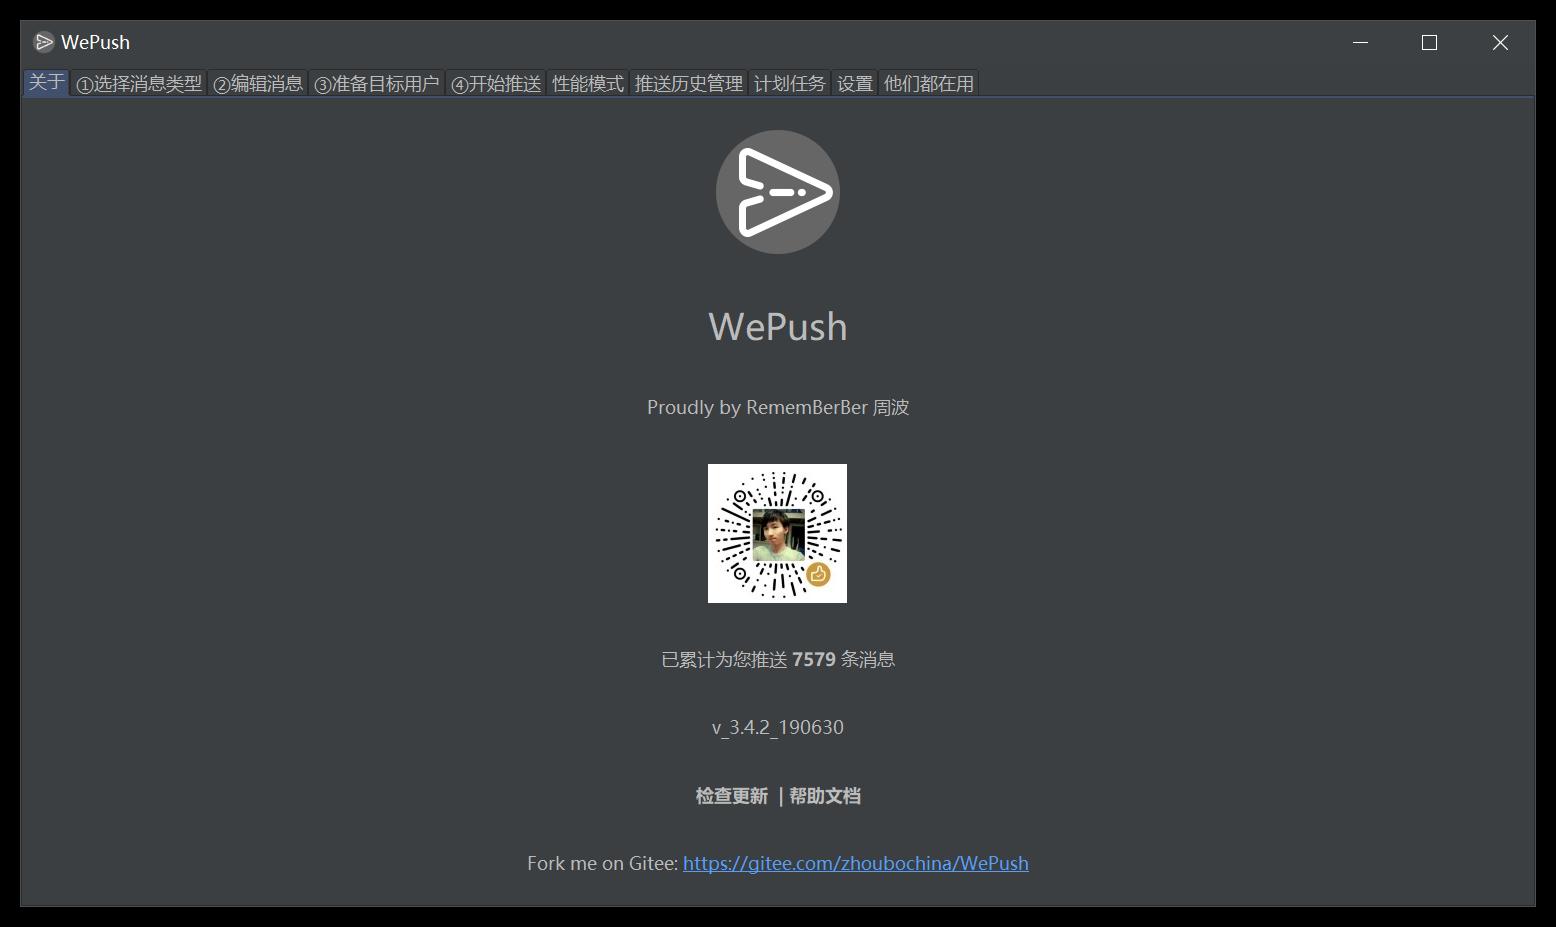 WePush